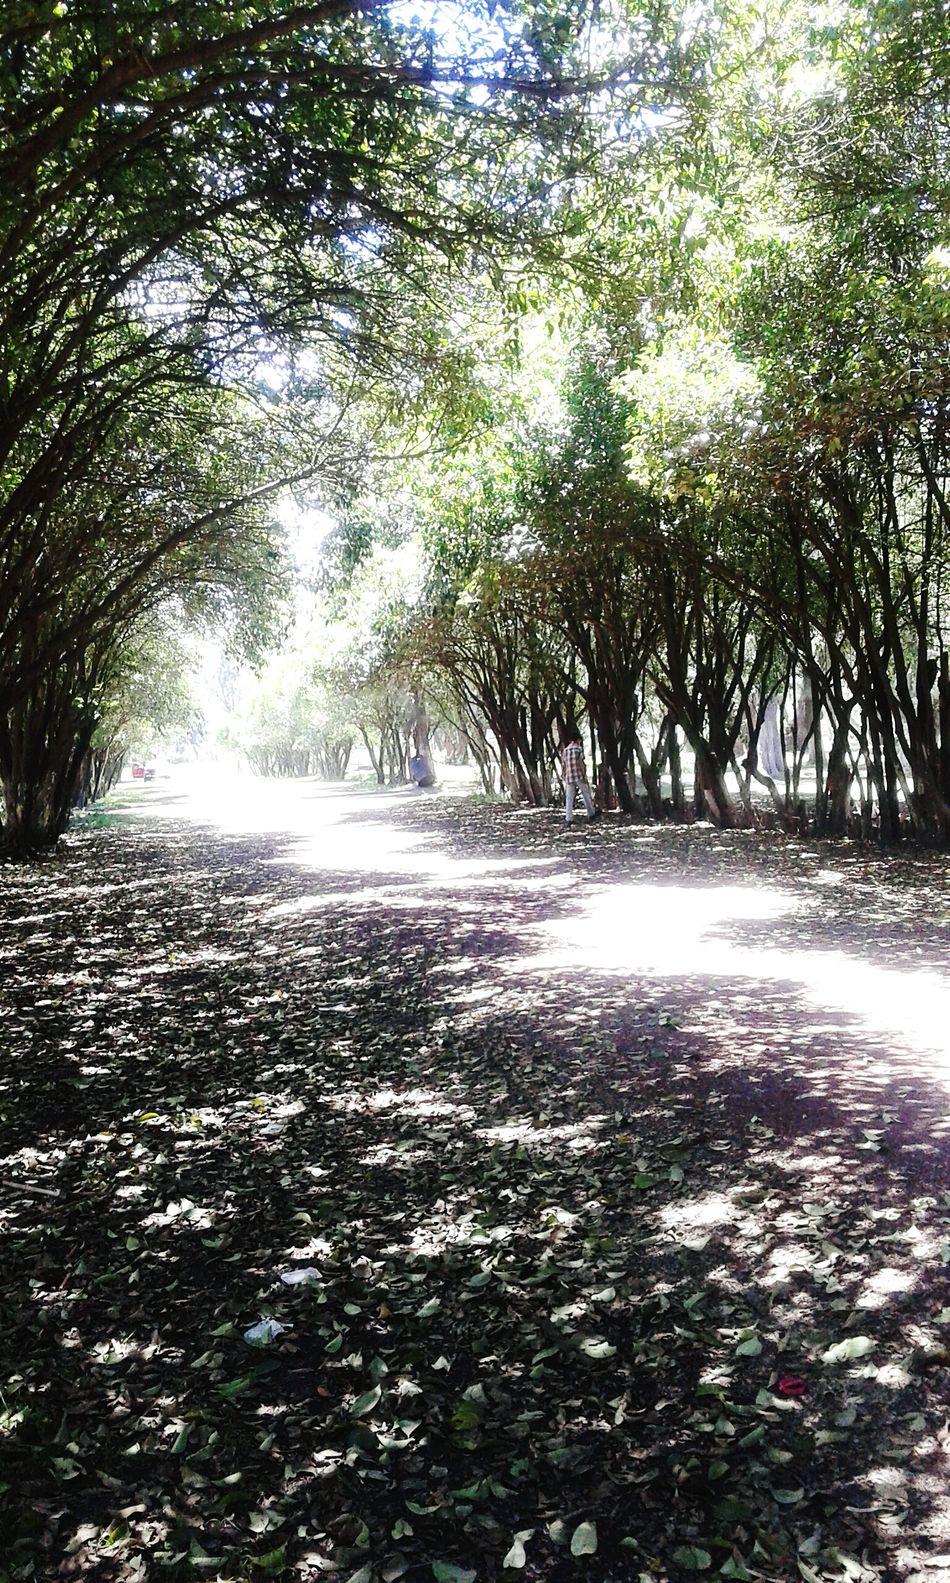 ♡ '''El amor... esa estrella de una sombra infinita aunque muera 5 veces...cien veces recucita.''''♡ In The Park The Sky The Natural Flowers... Trees...air.🐾⛅🌼🌹